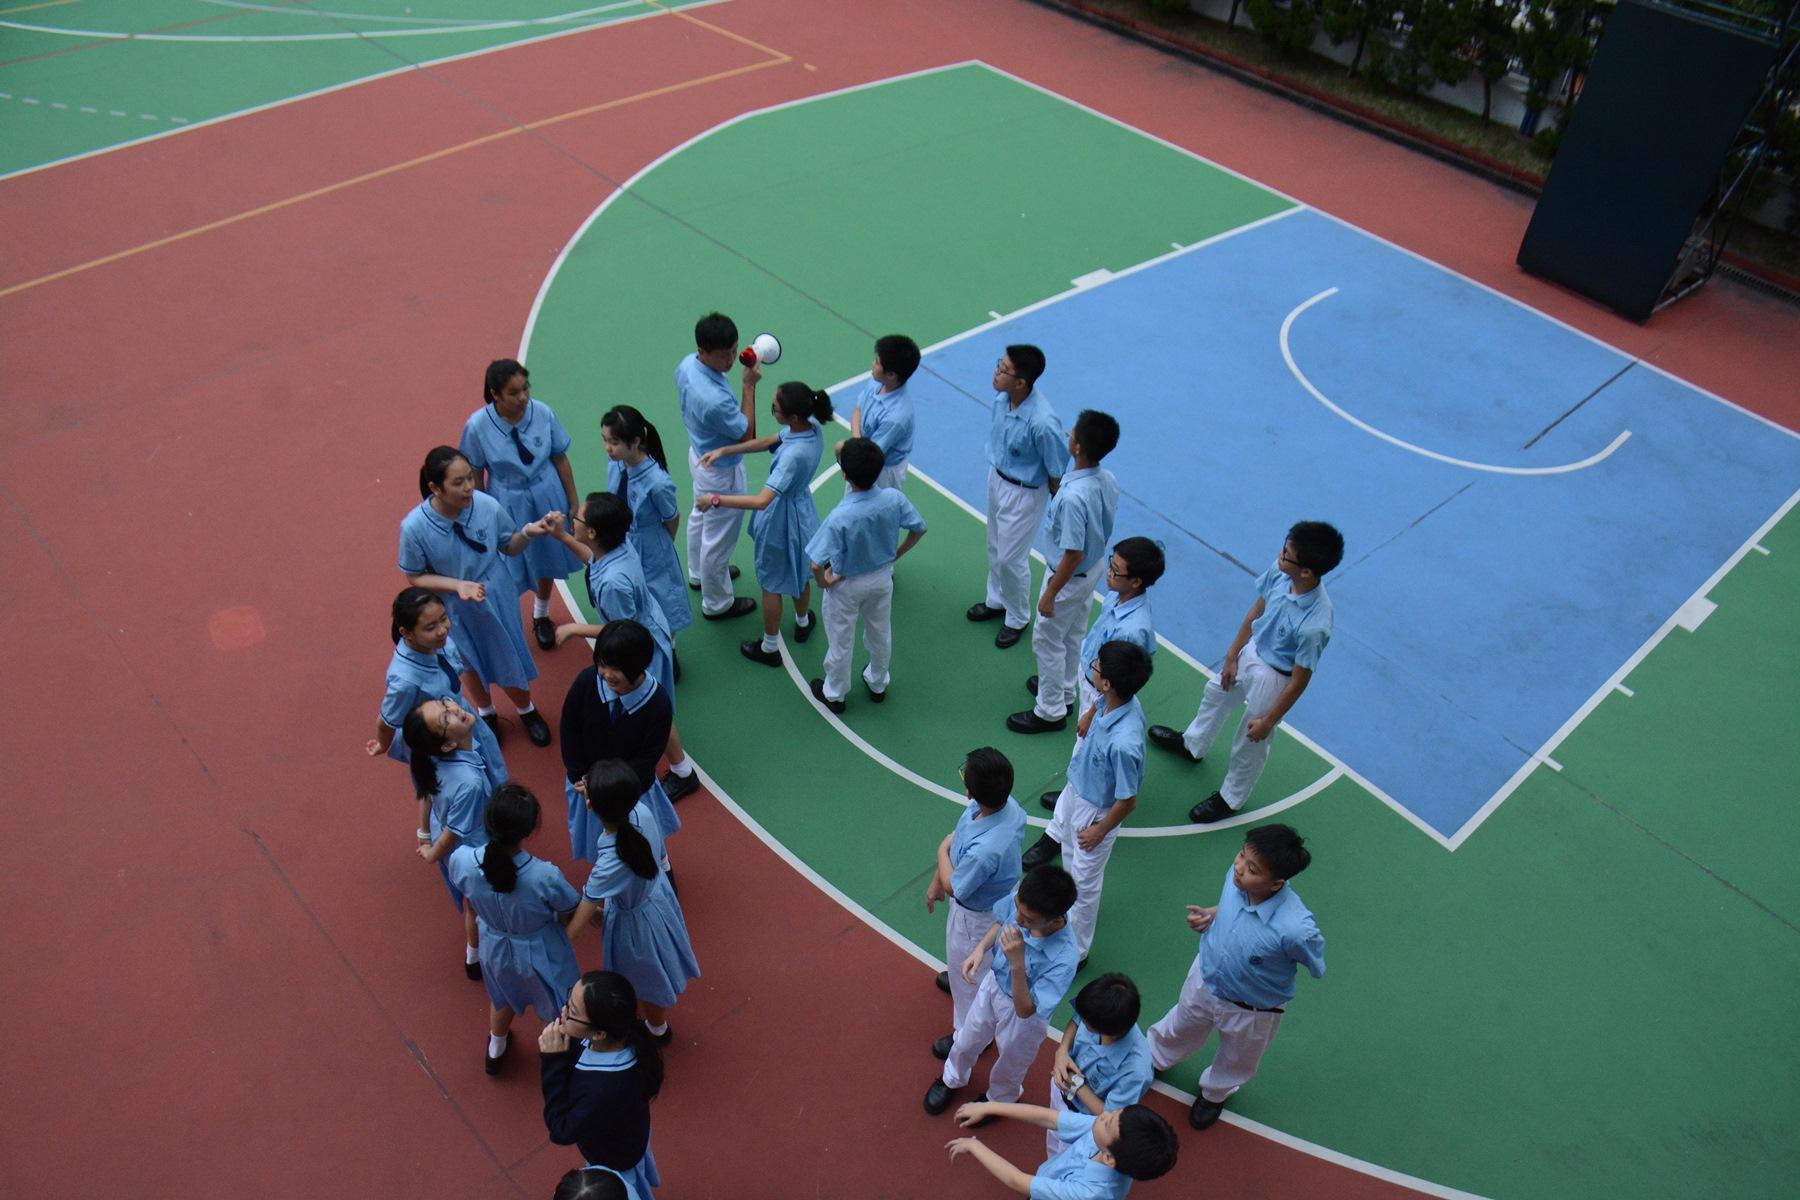 http://www.npc.edu.hk/sites/default/files/dsc_5531.jpg